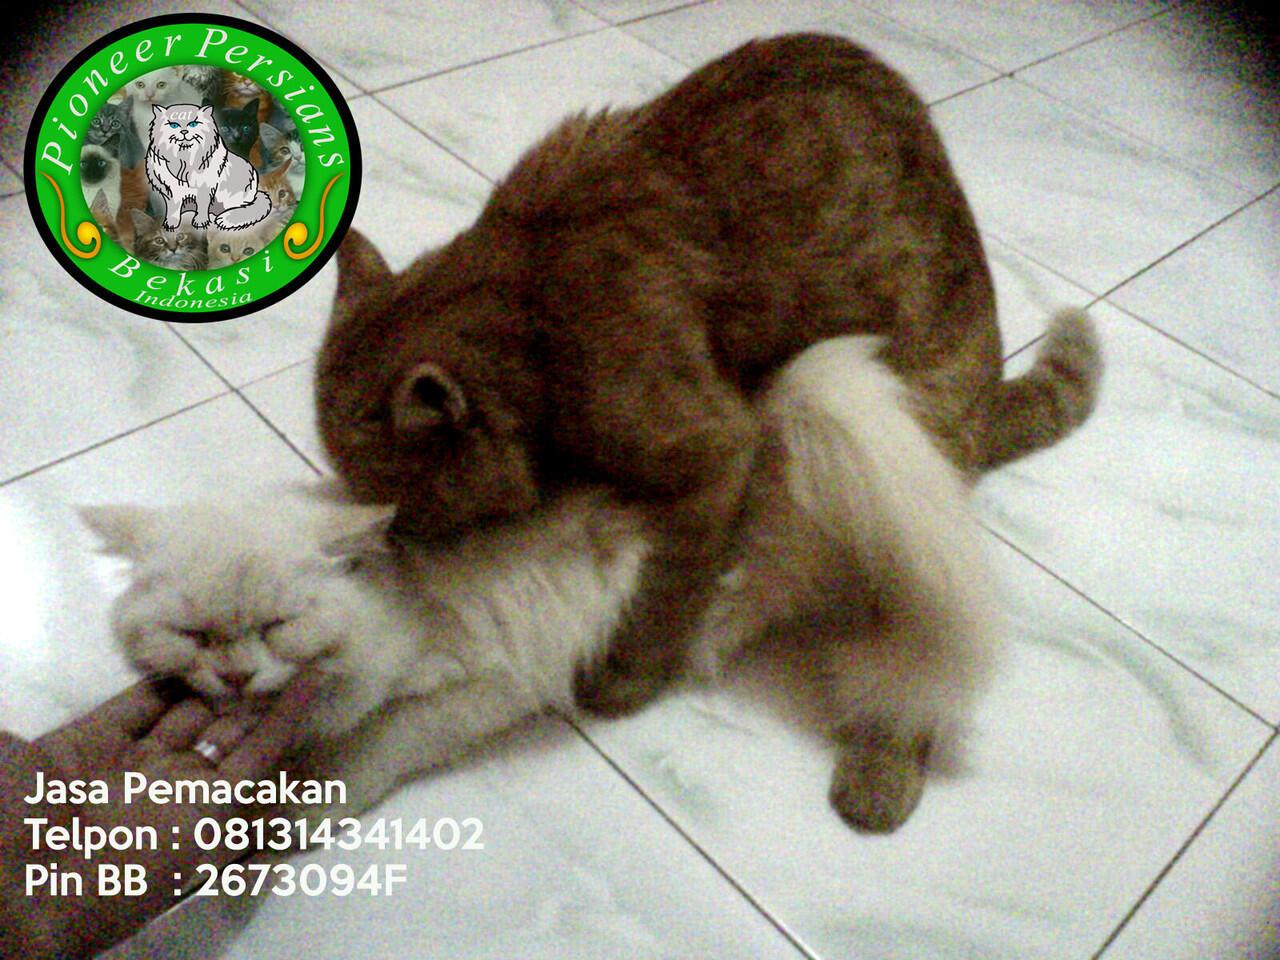 Jasa Pemacakan Kucing Persia Exotic Extreme